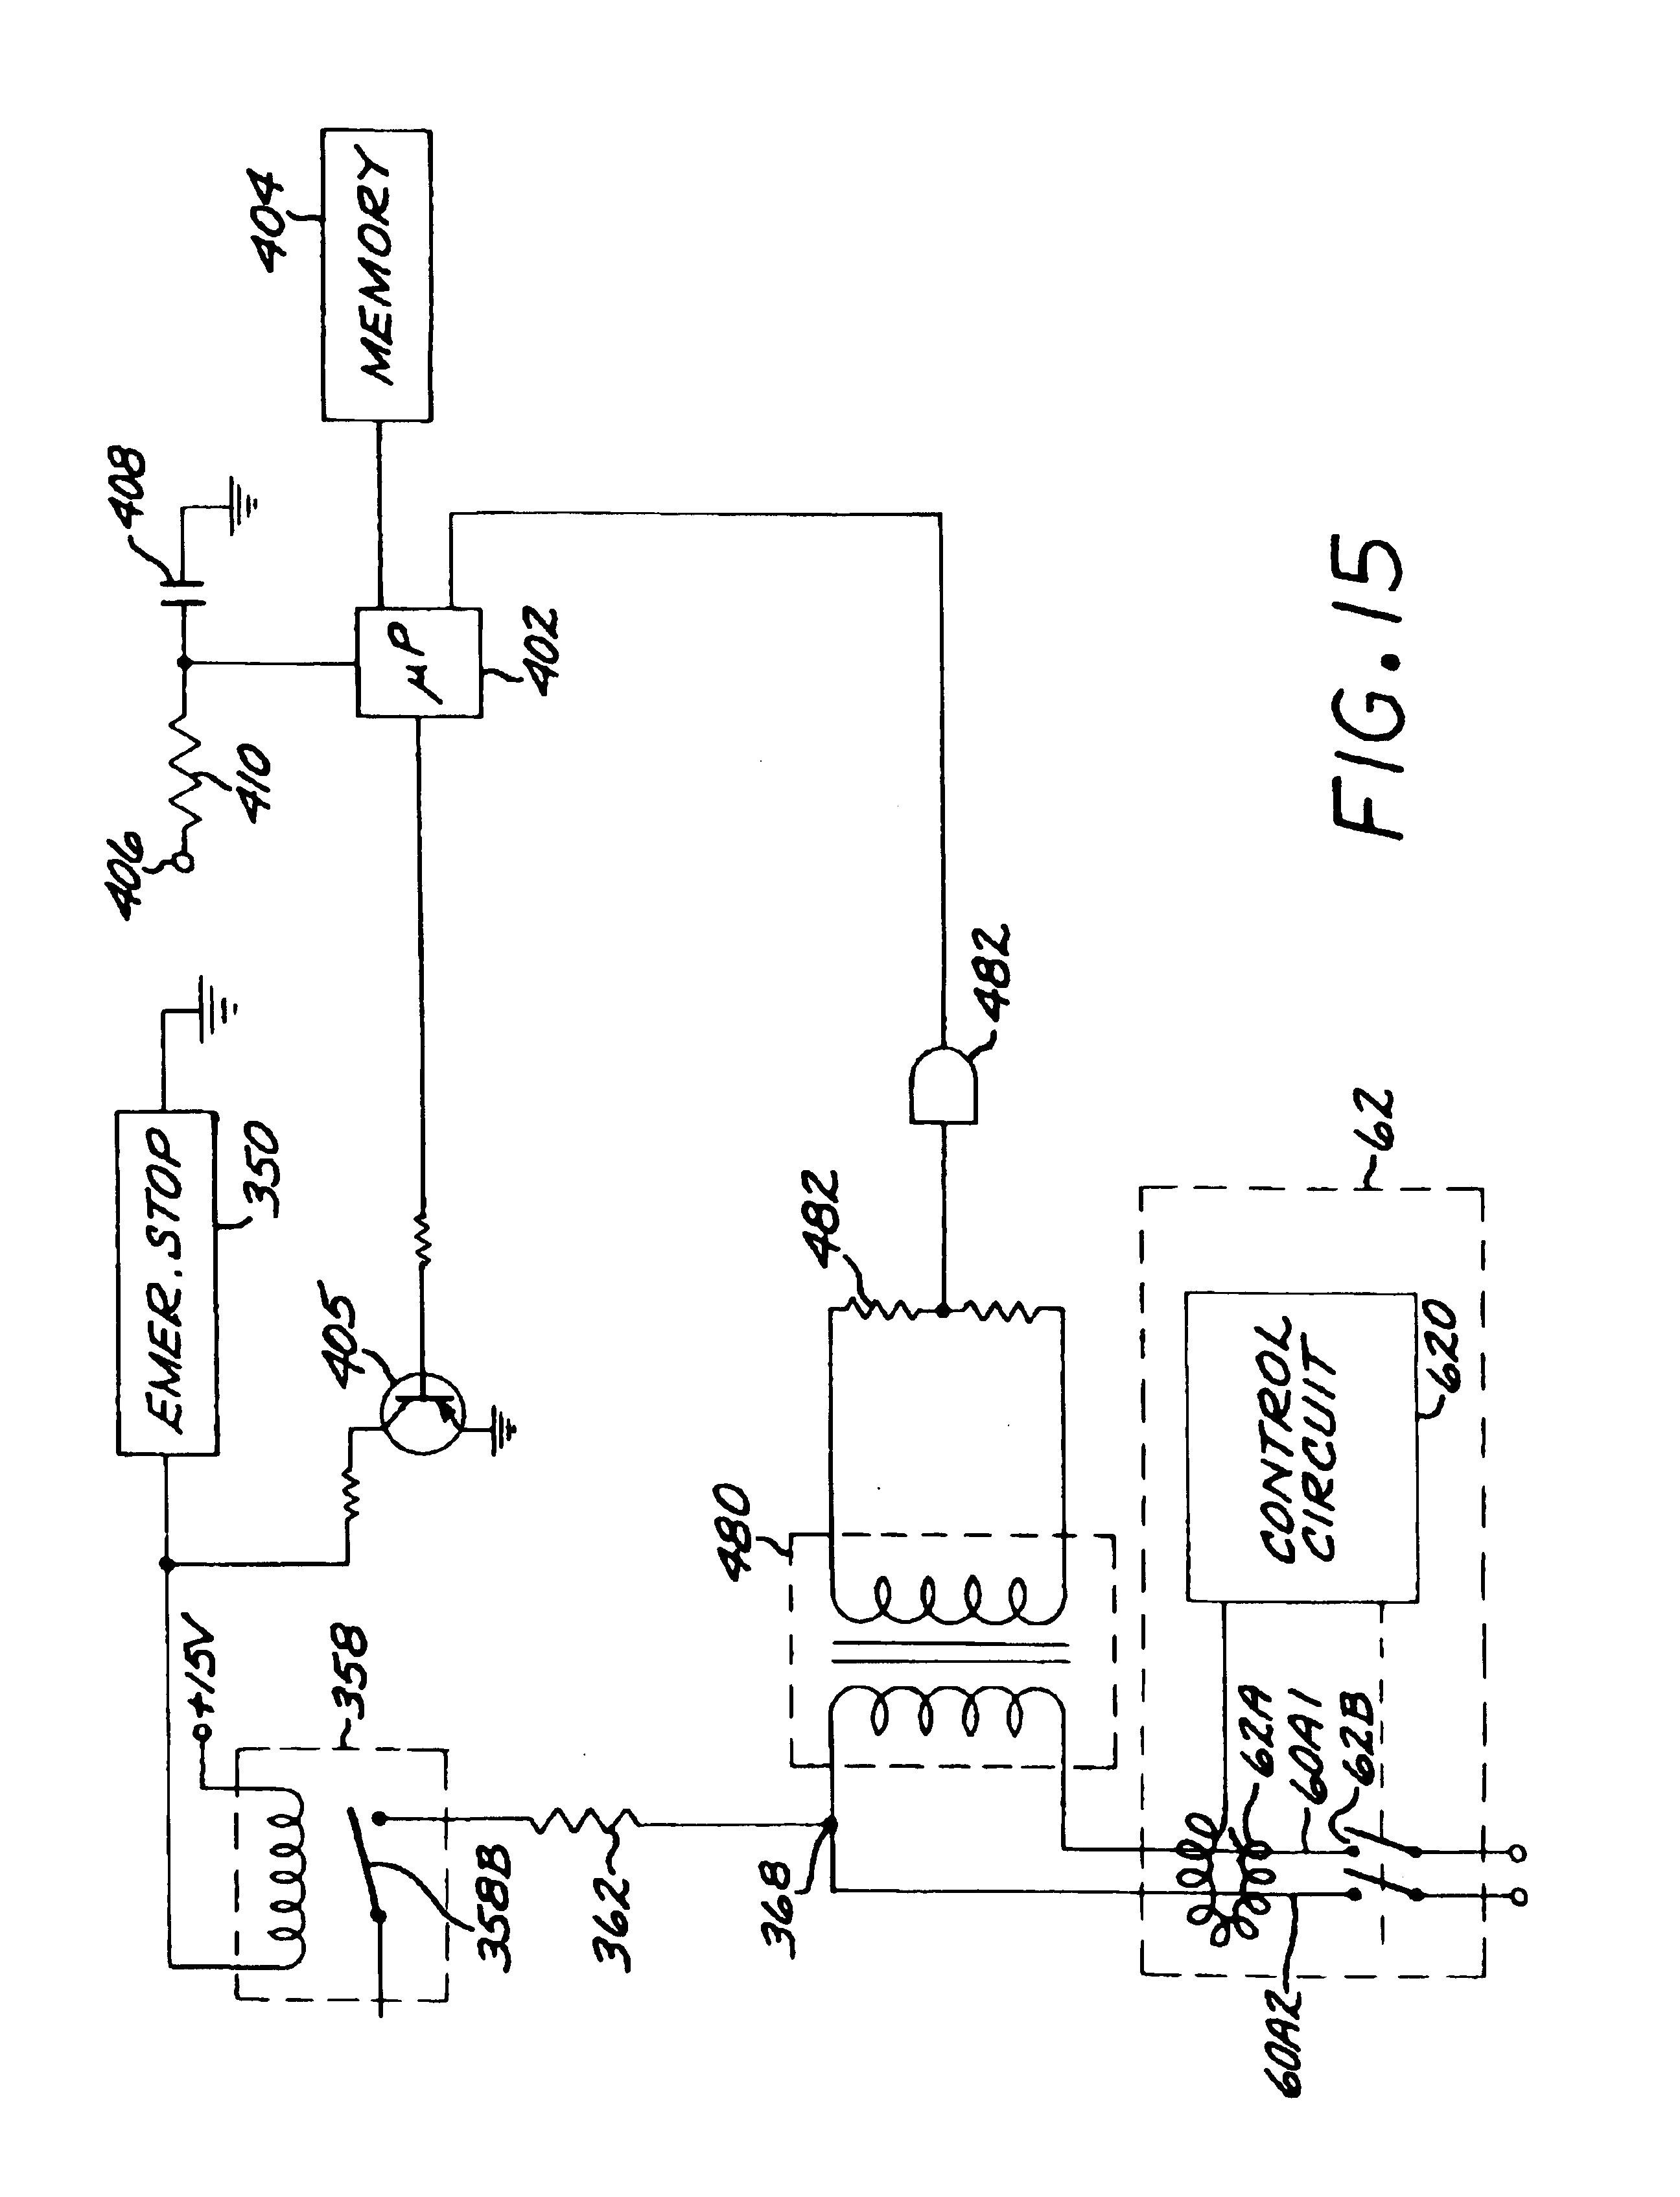 sta rite pump wiring diagram sta rite pump wiring diagram collection fill rite pump wiring diagram 13 t download wiring diagram detail name sta rite pump 8b jpg